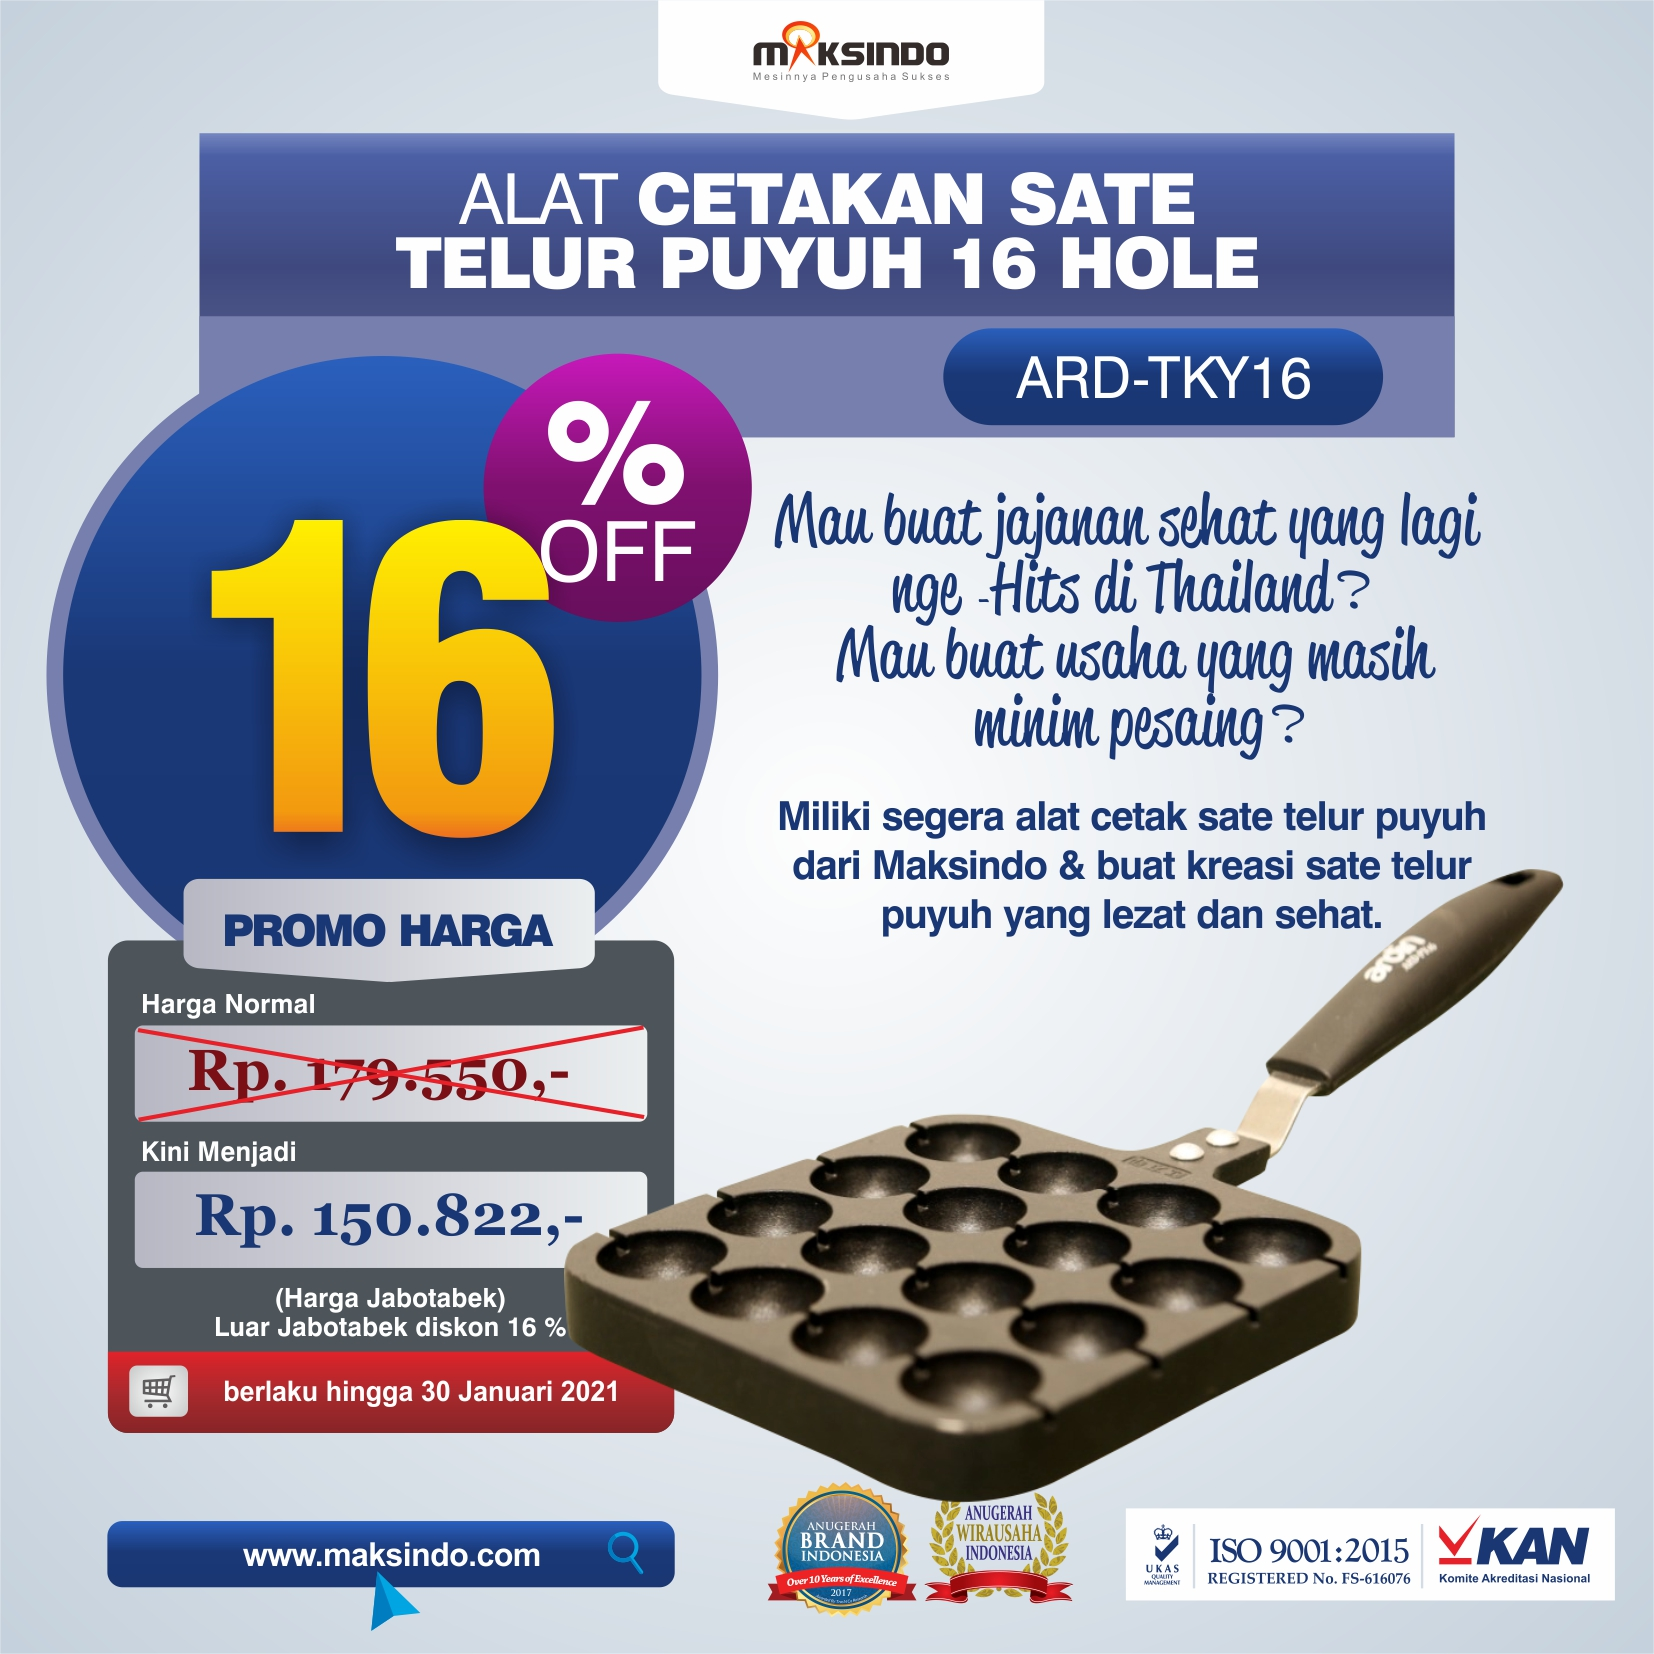 Jual Alat Cetakan Sate Telur Puyuh 16 Hole Ardin TYK16 di Tangerang